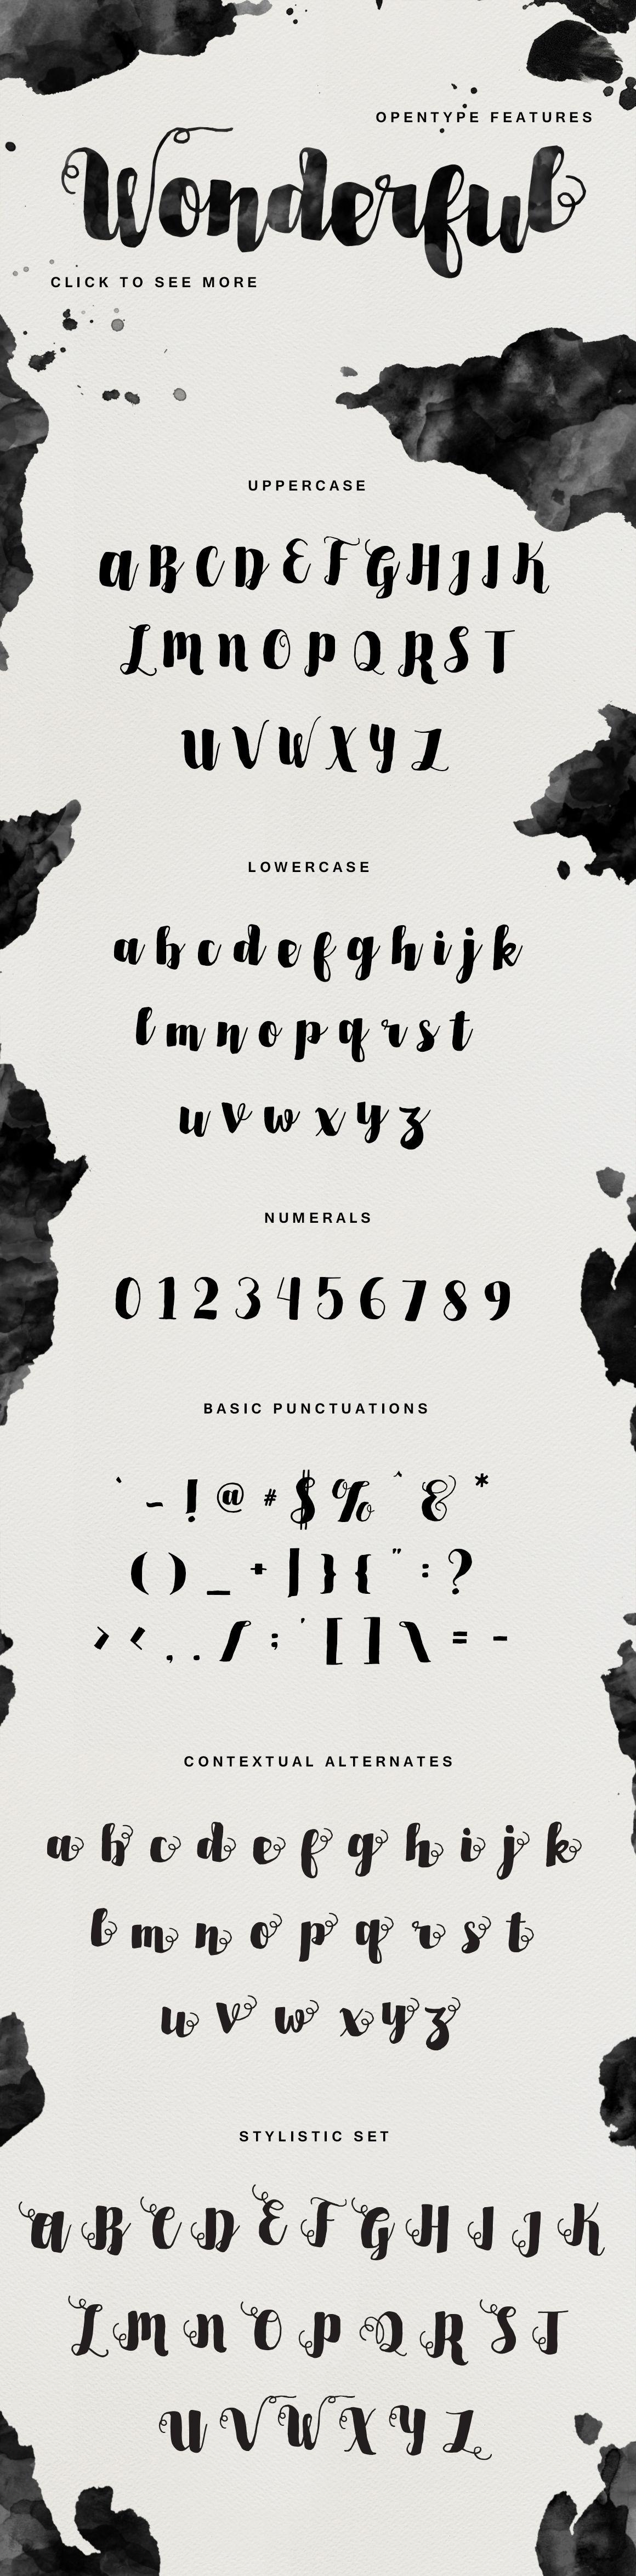 Sortdecai Brush Script by Swistblnk Design Std. on @creativemarket